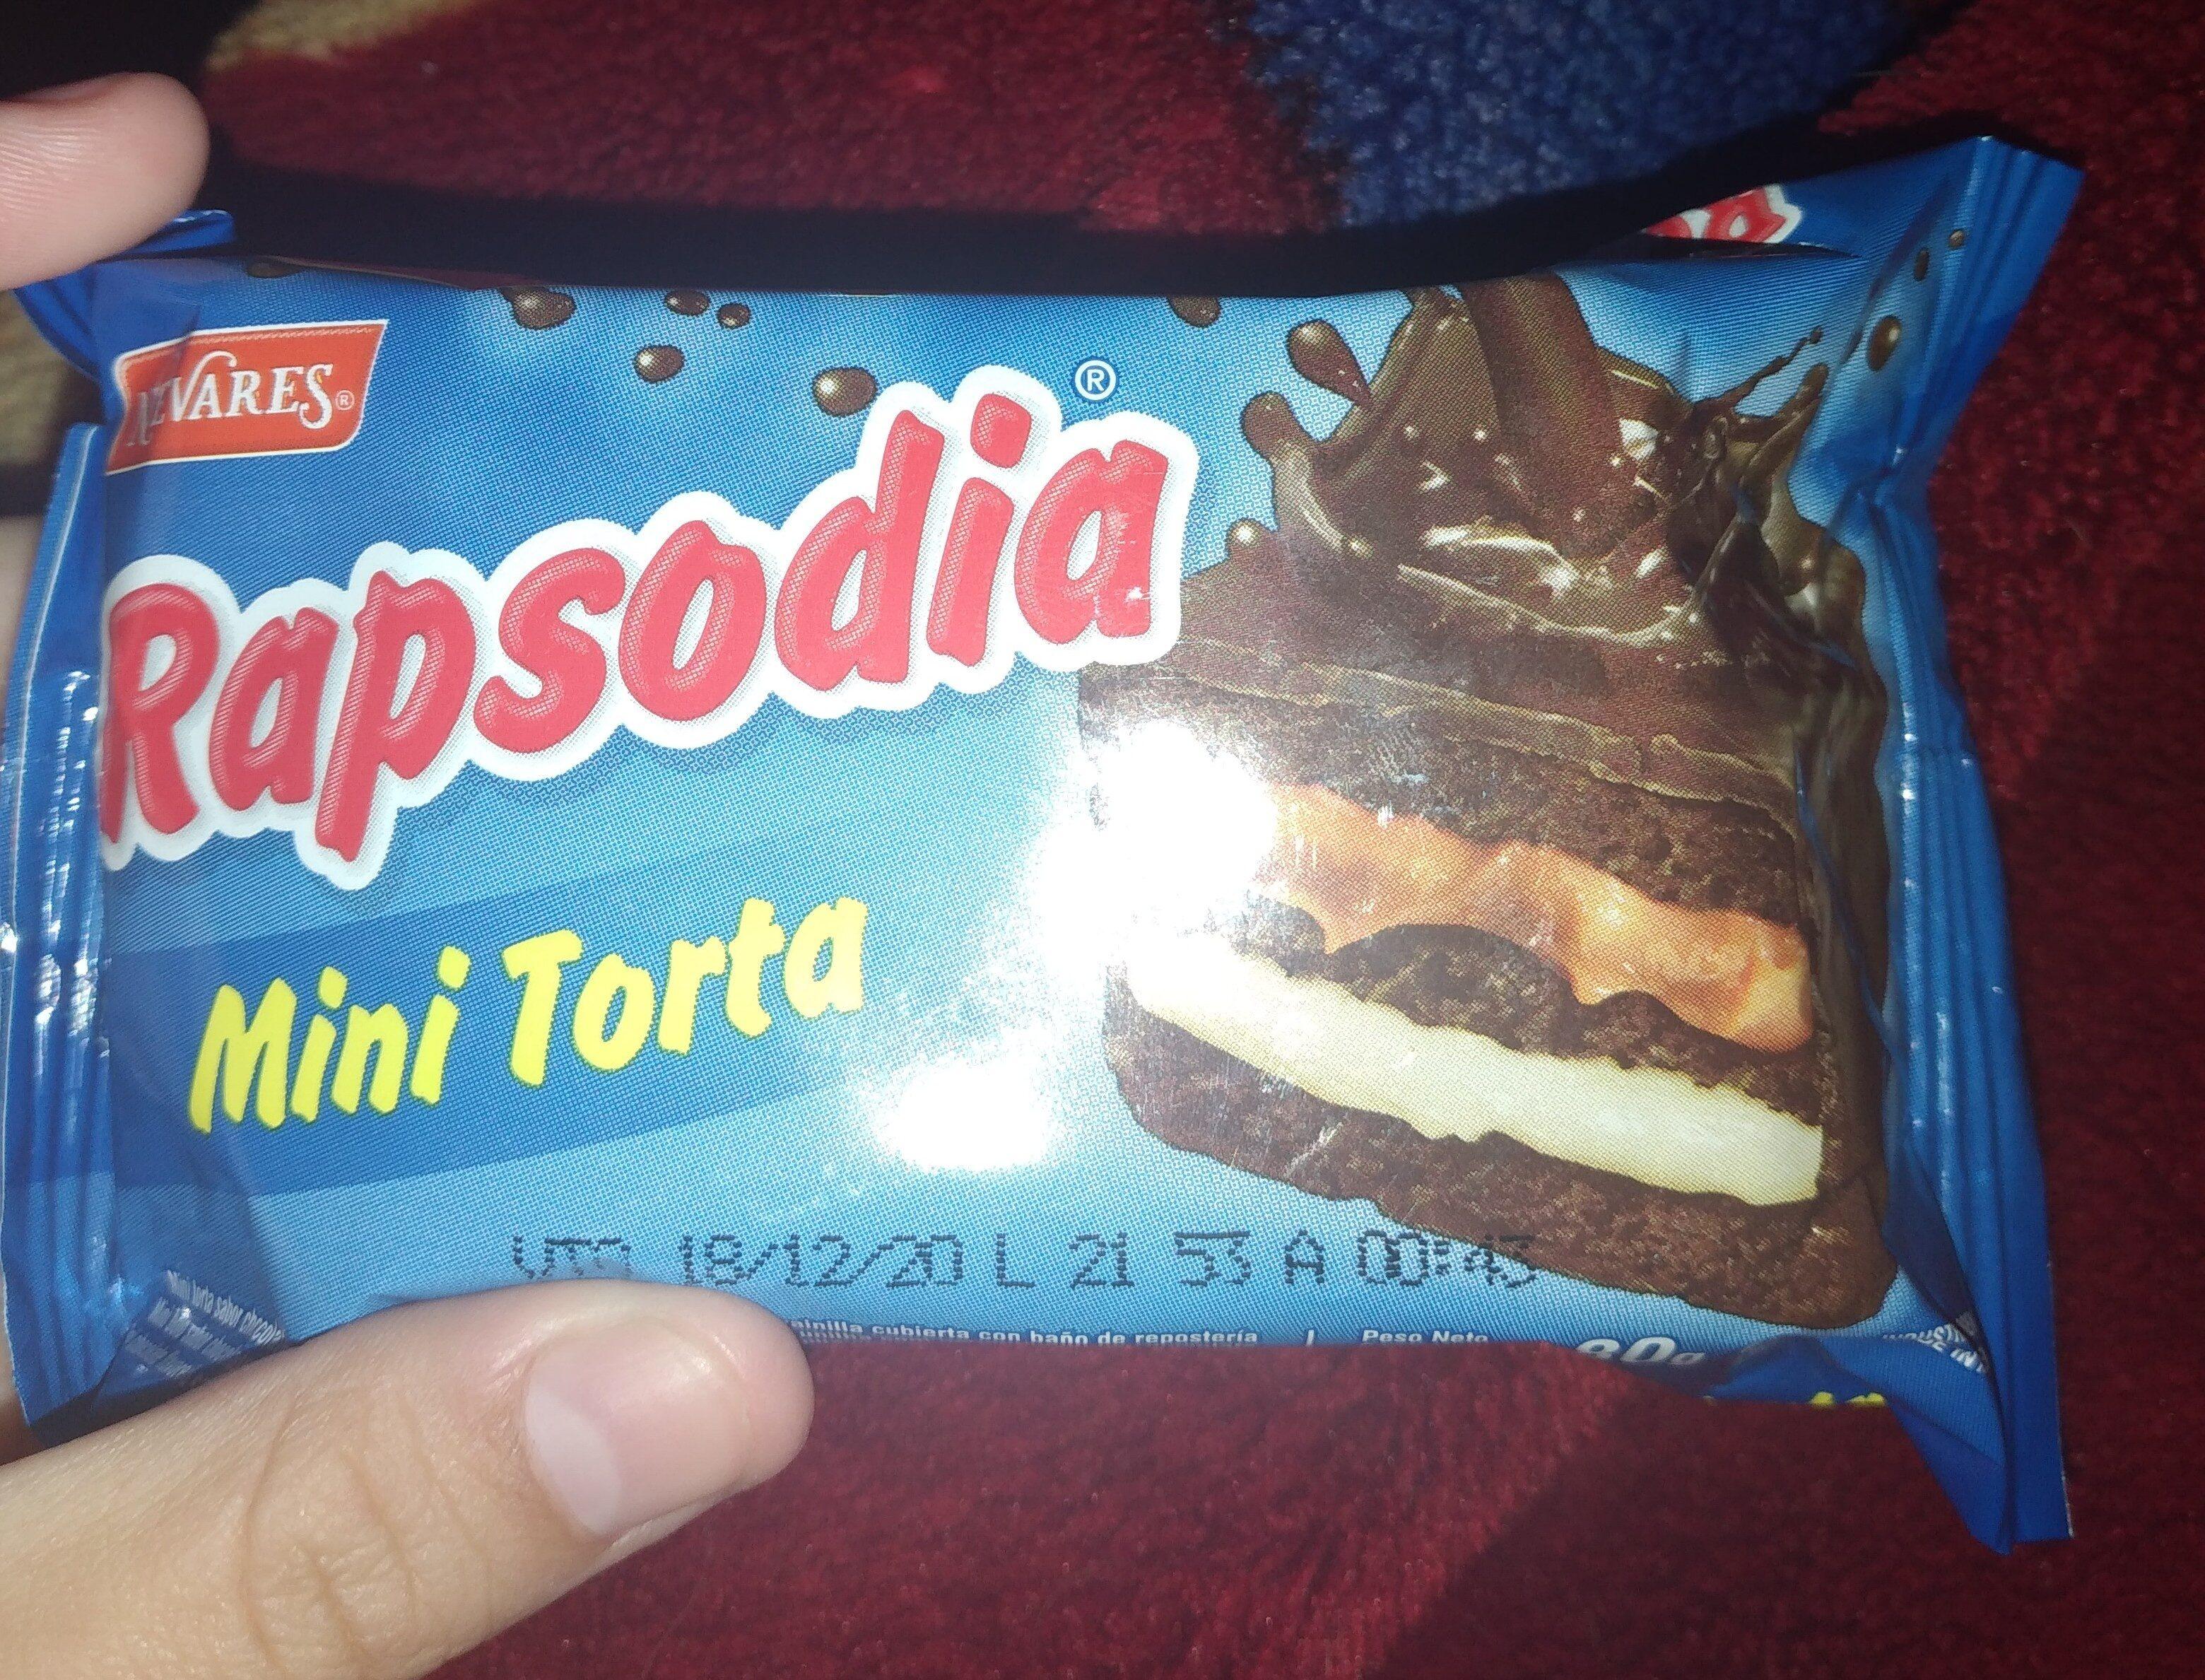 Minitorta Rapsodia - Ingrédients - es